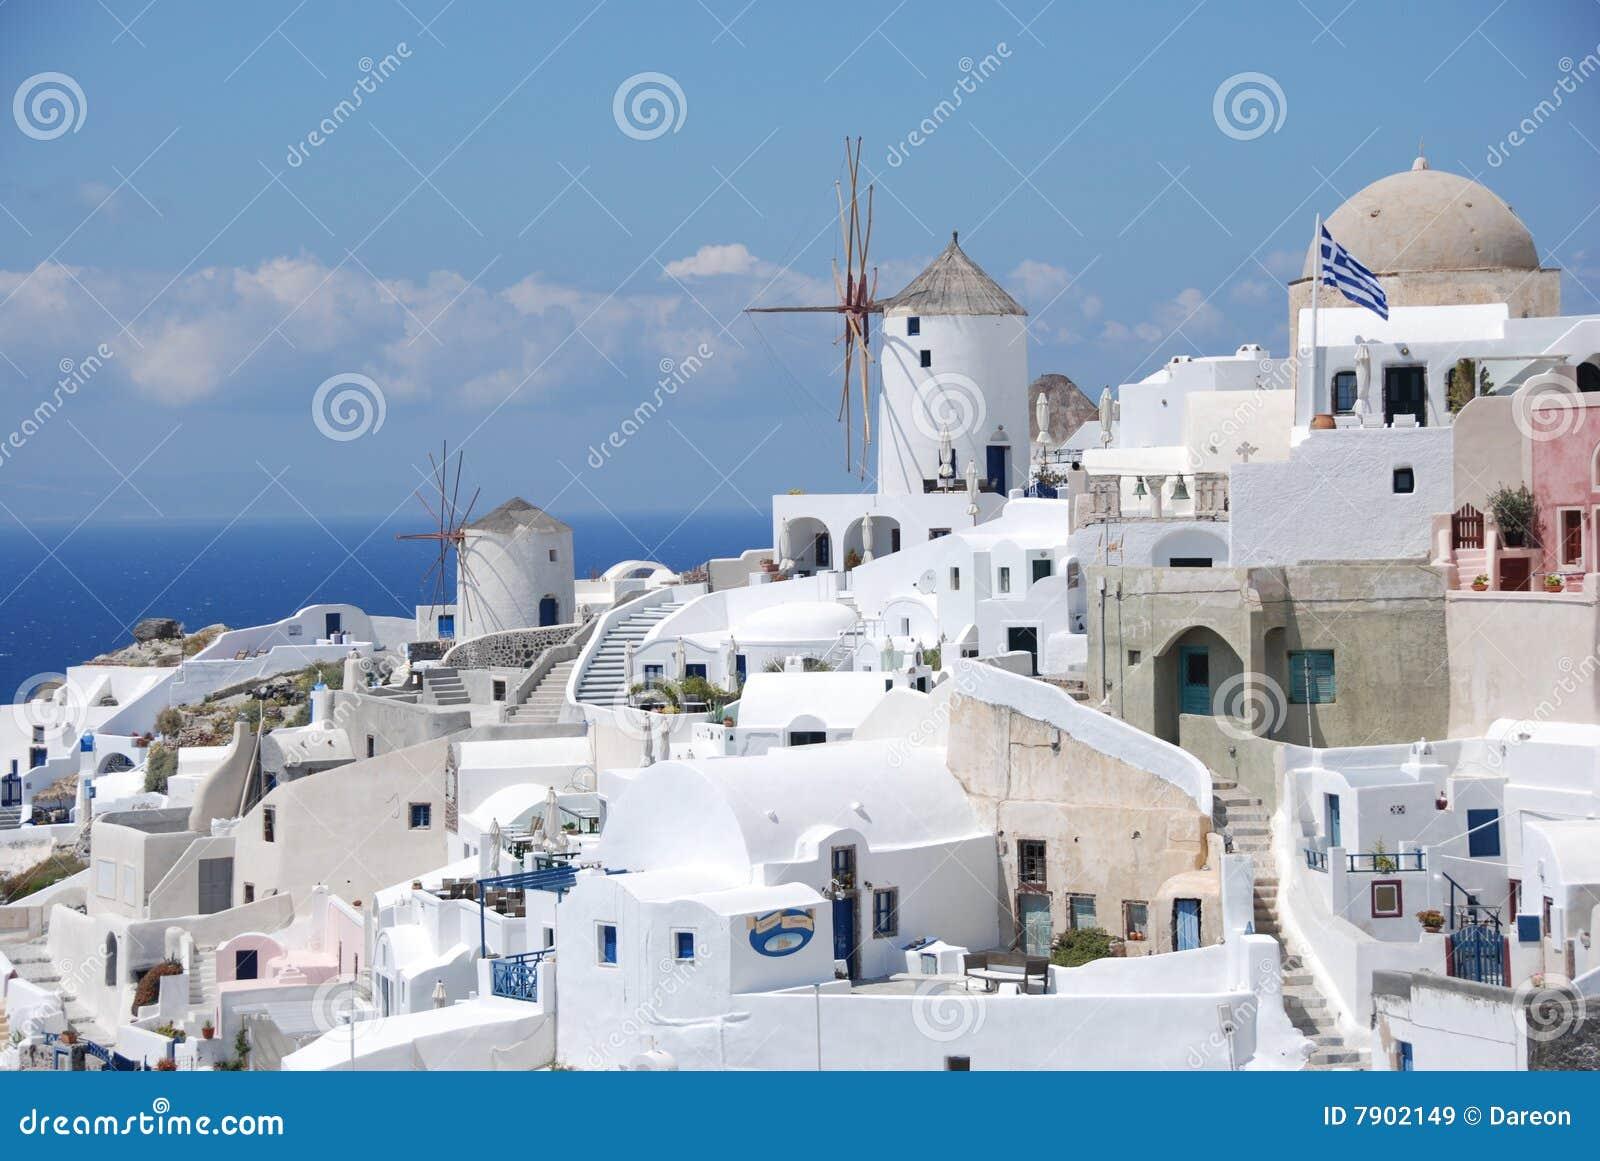 Santorini or Mykonos? – The 2017 Guide